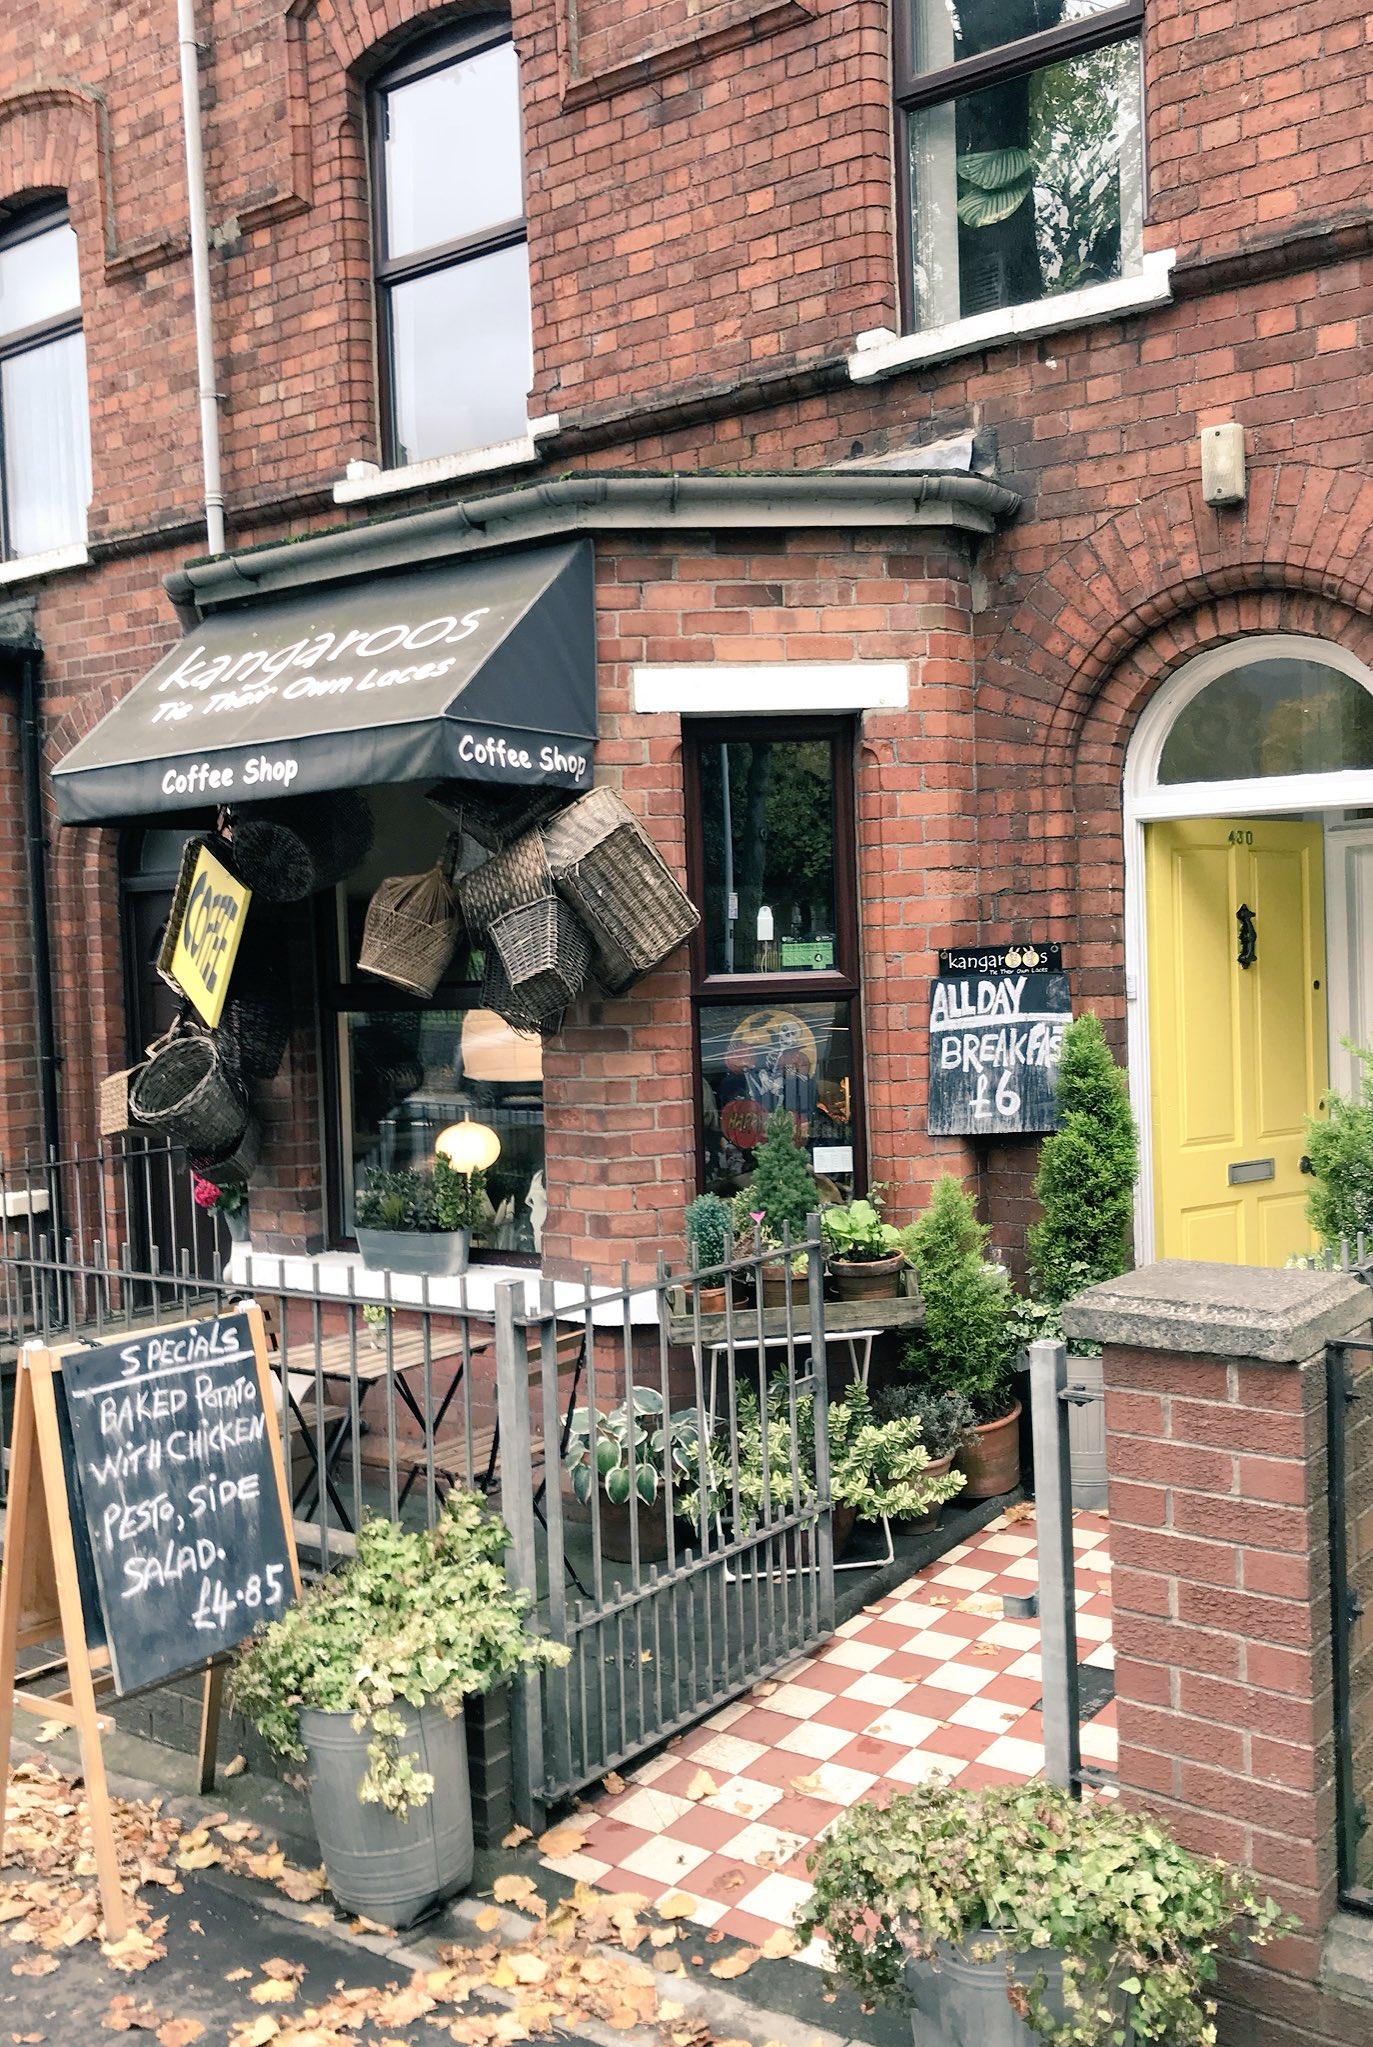 Belfast coffee shops Kangaroos tie their own shoe laces